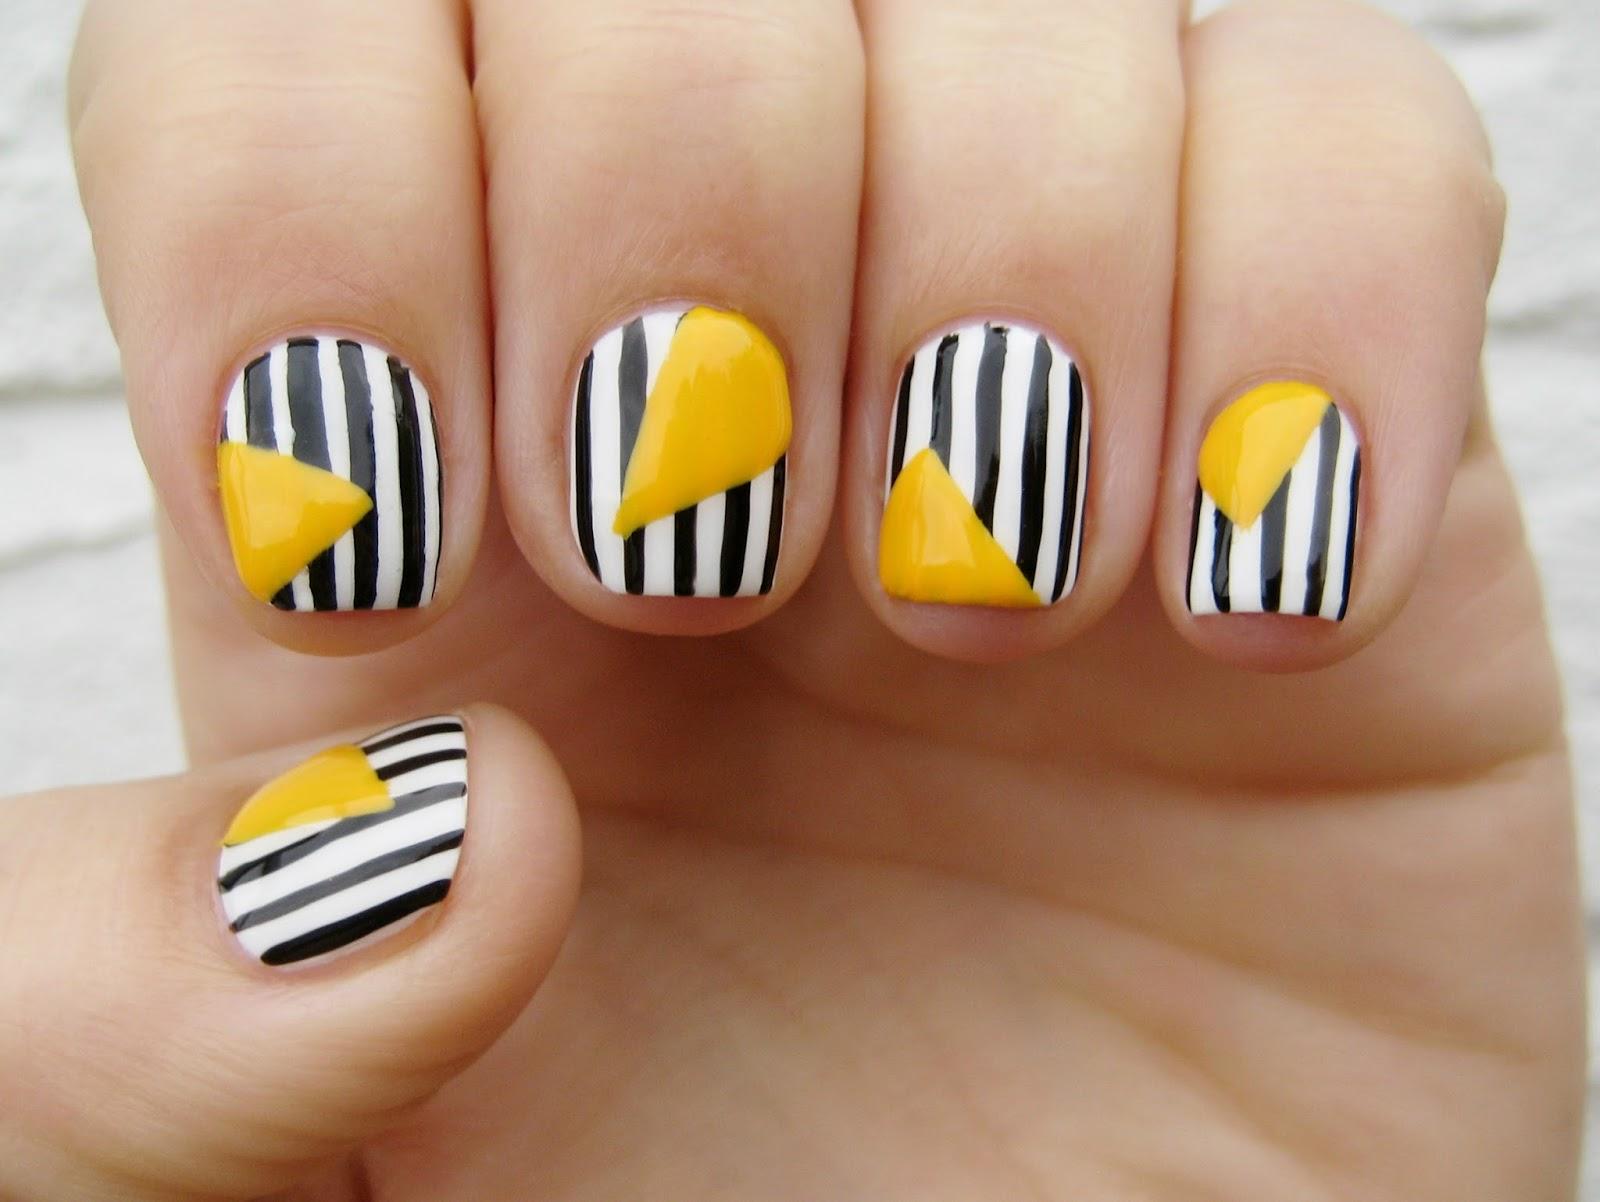 Dahlia Nails Monochrome Mustard